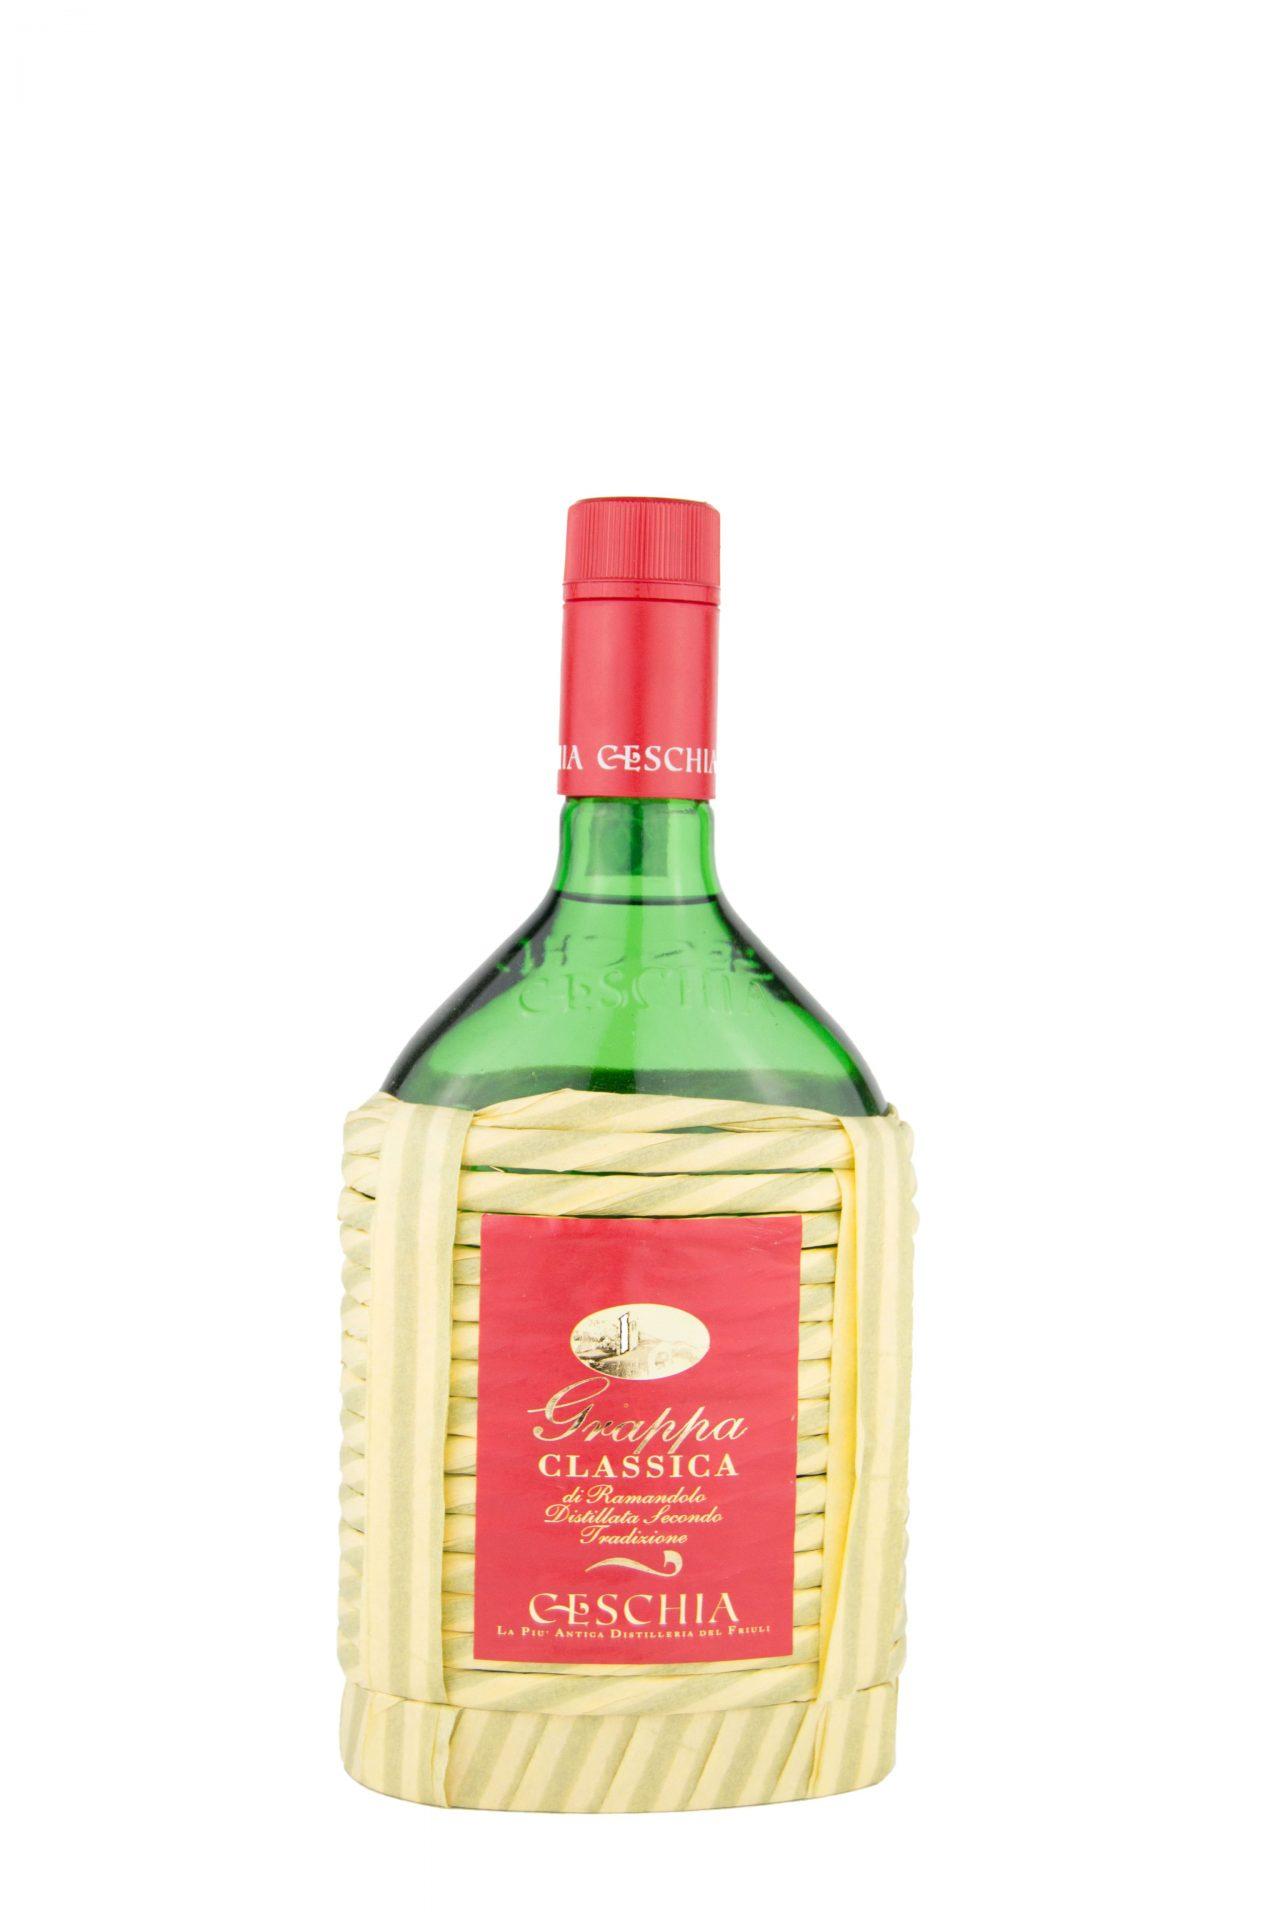 Ceschia – Grappa Classica